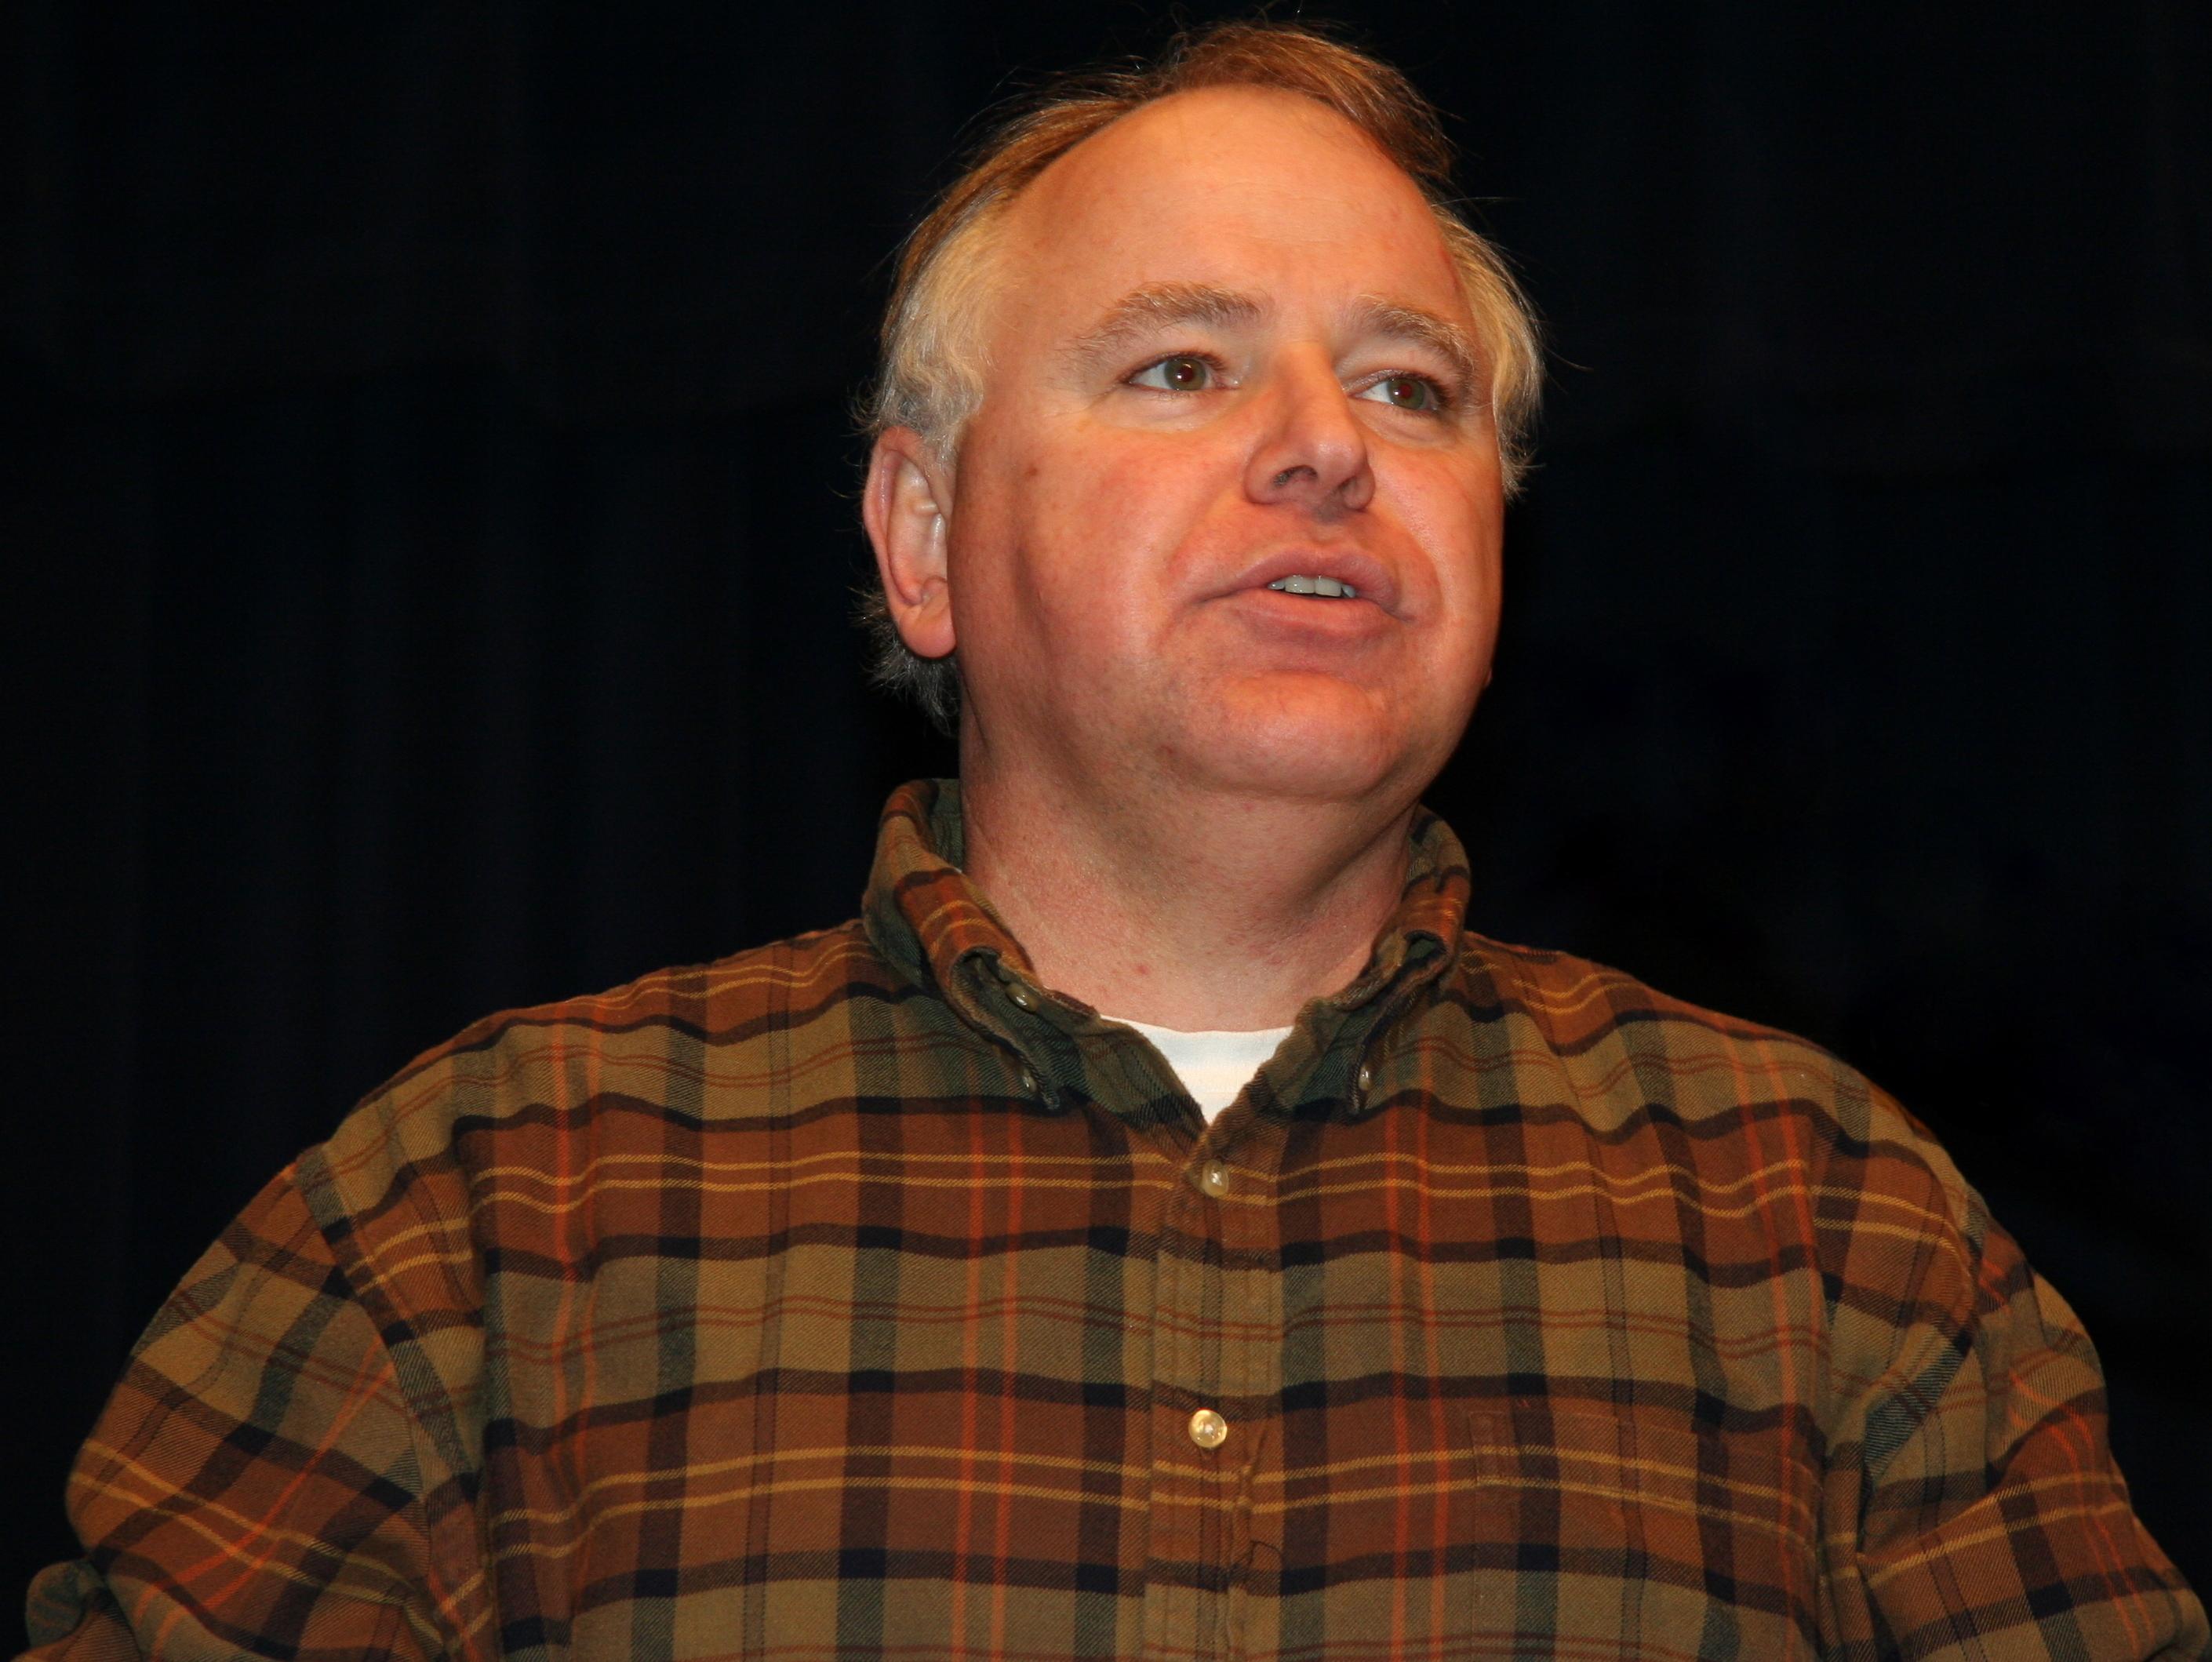 Tim Walz